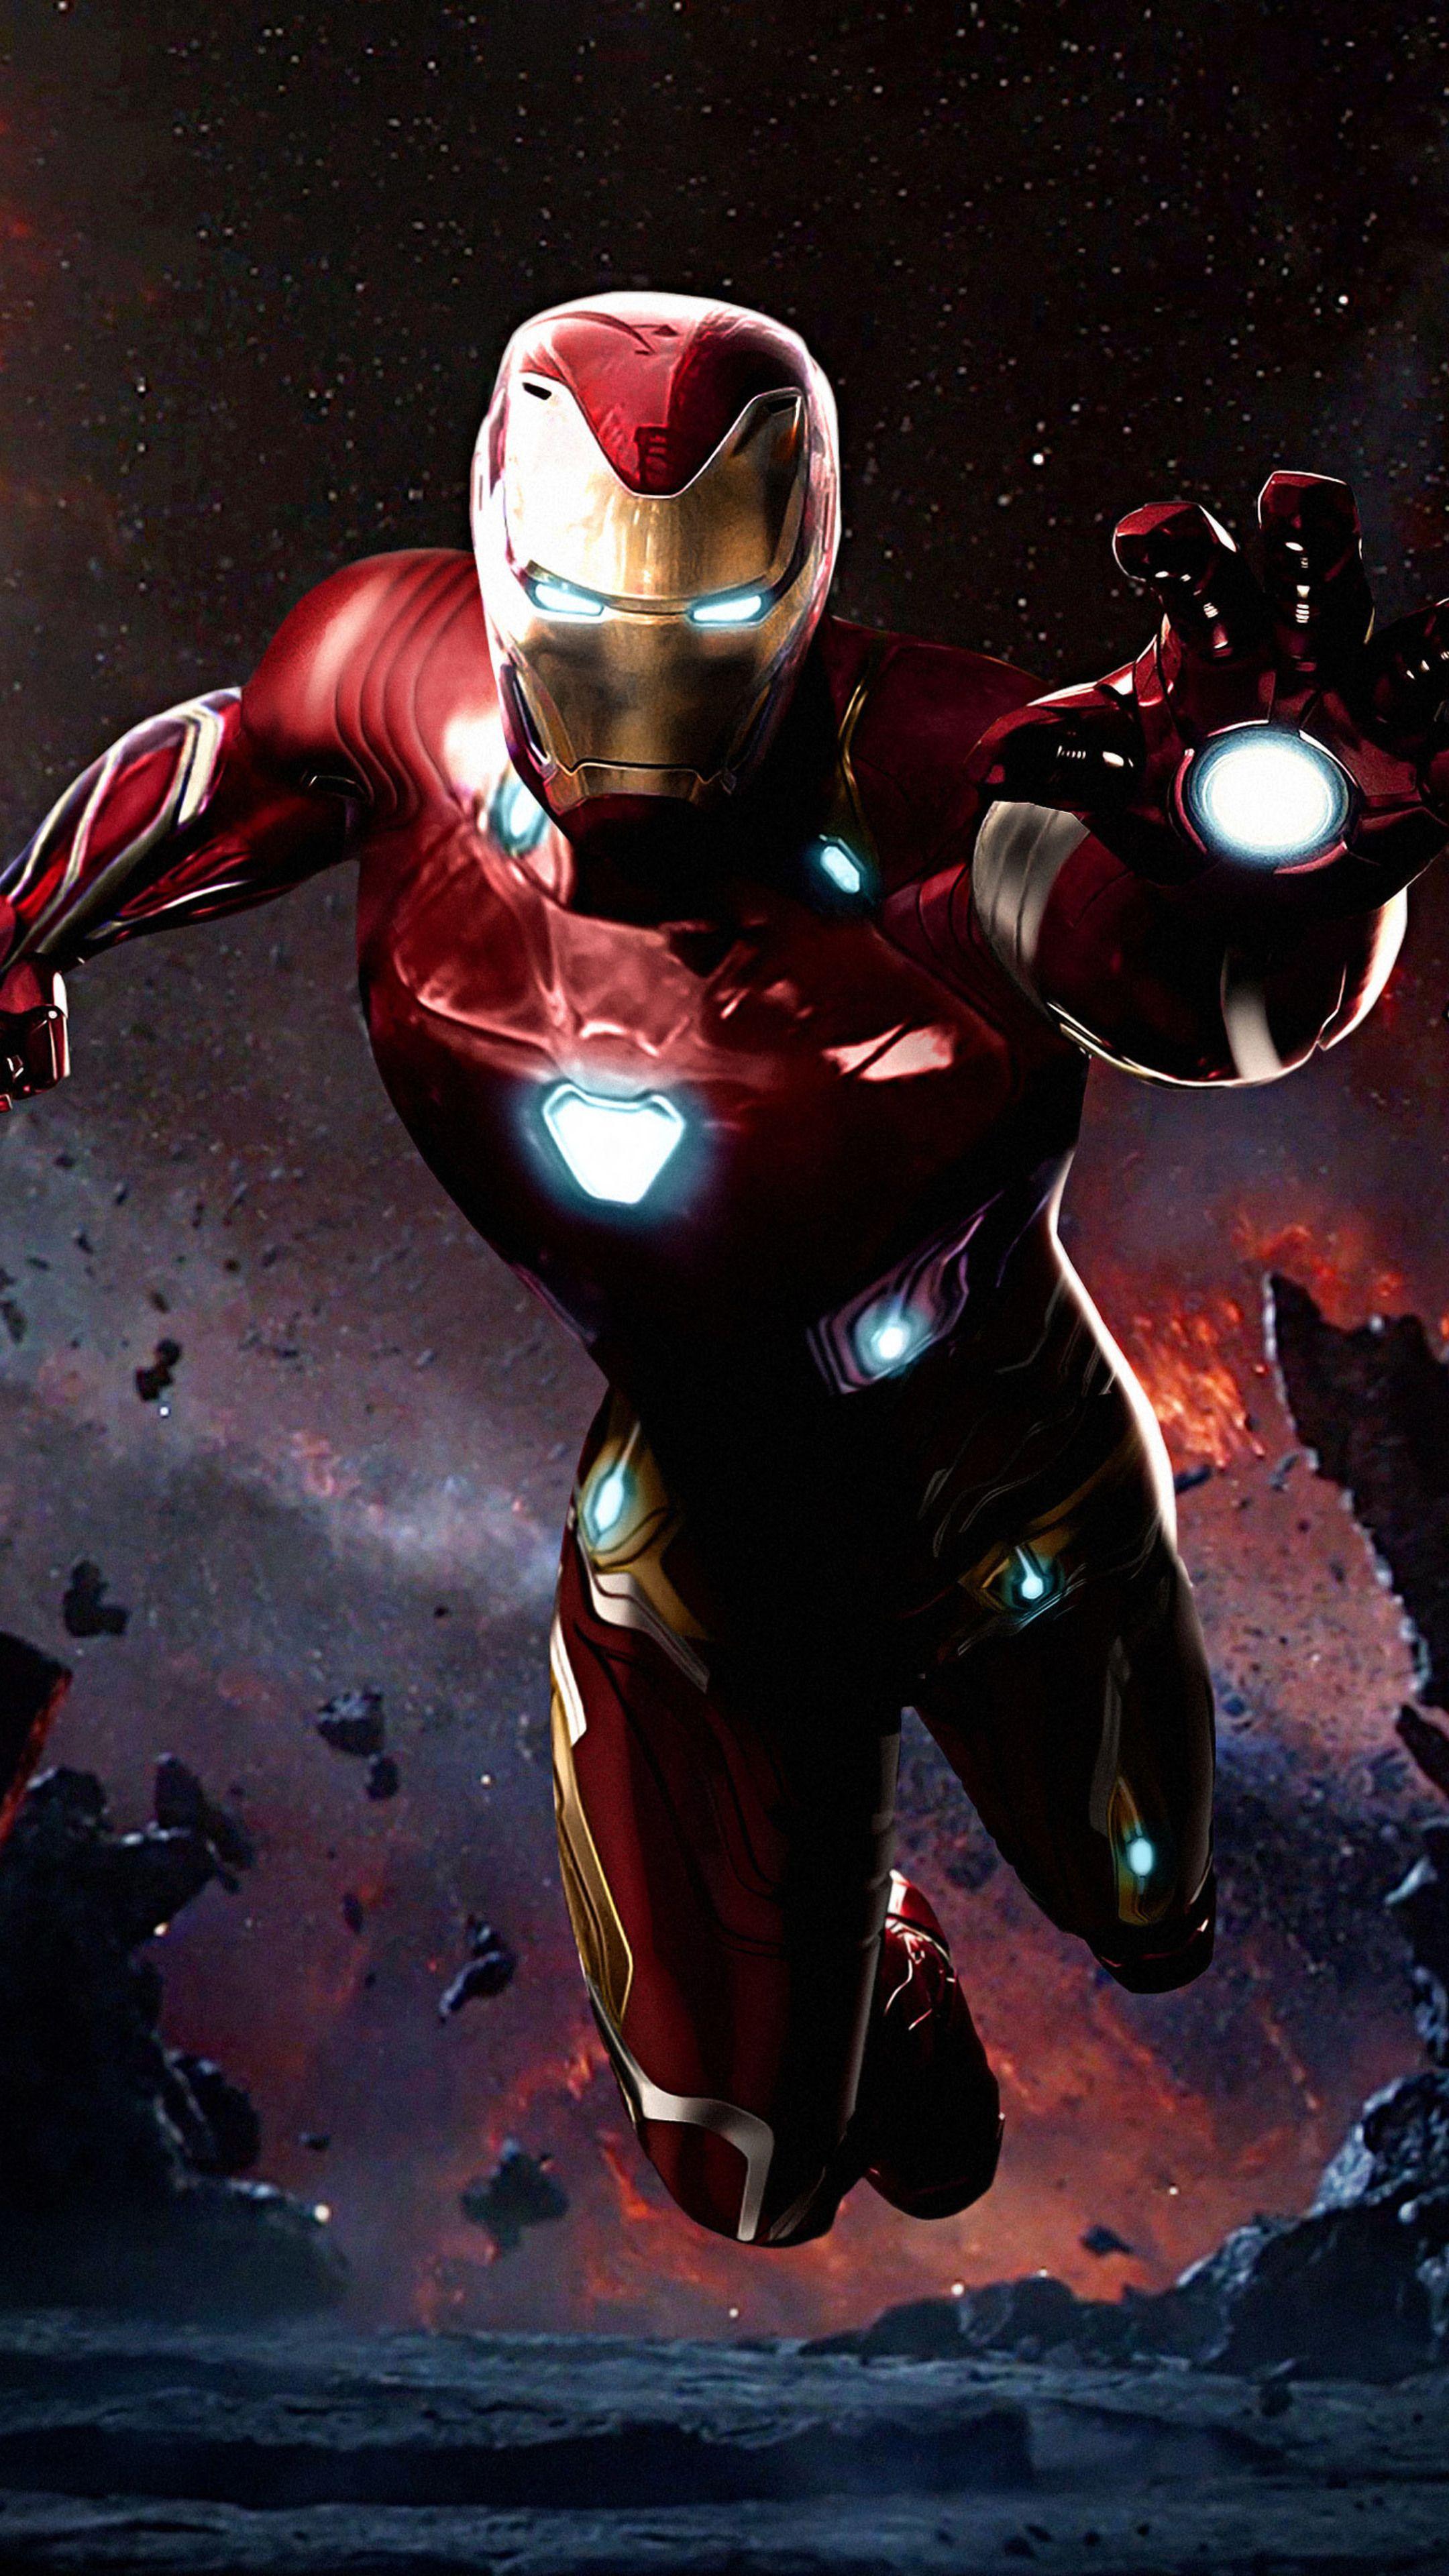 resultado de imagen para avengers infinity war iron man | tony stark